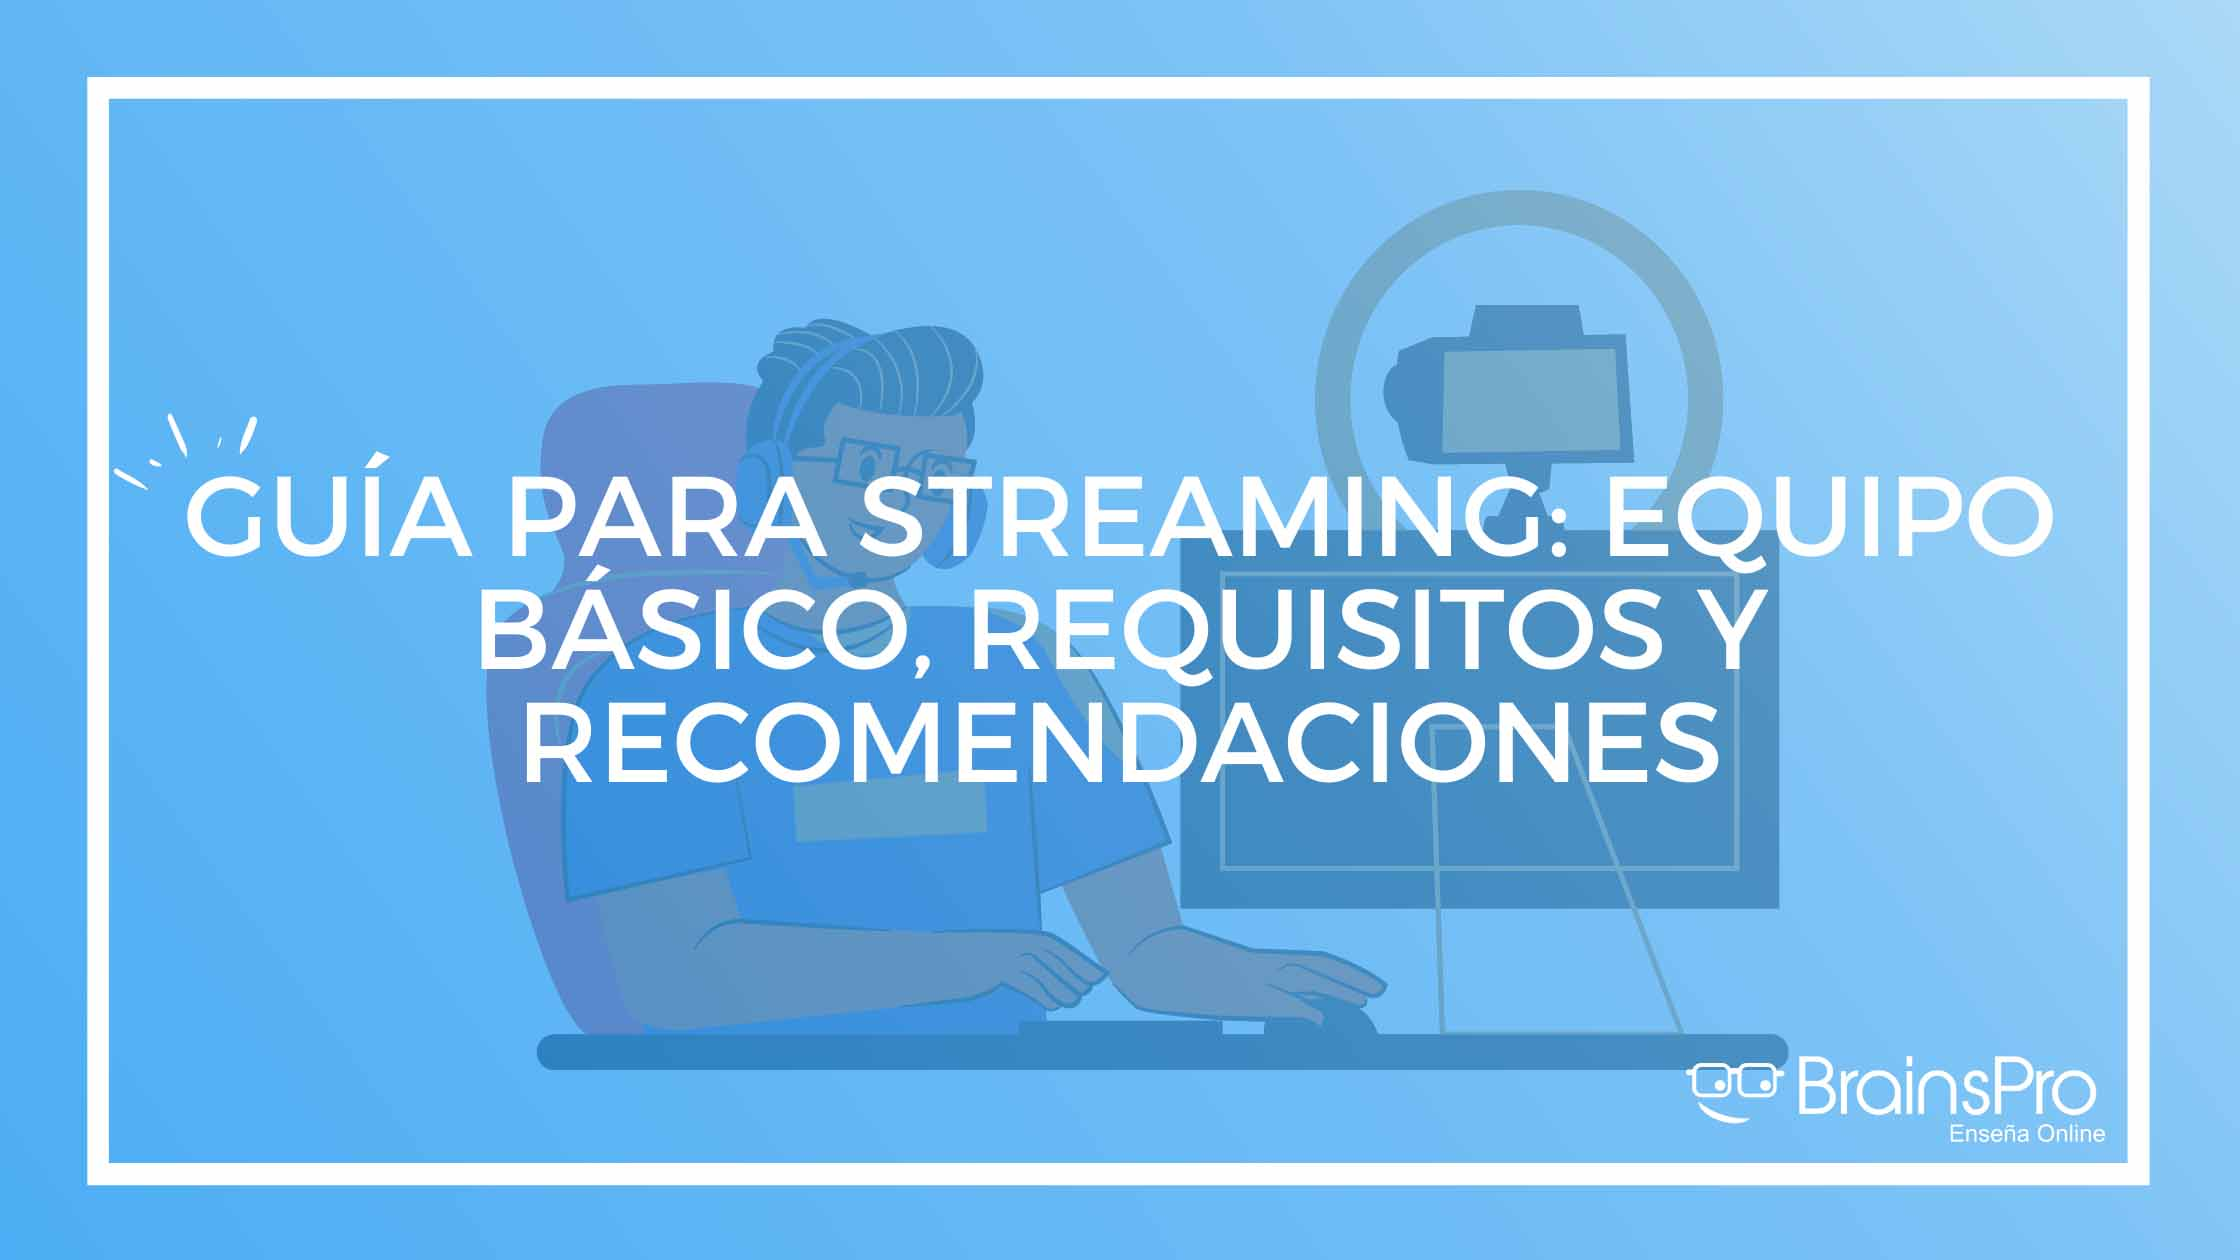 Guía para Streaming